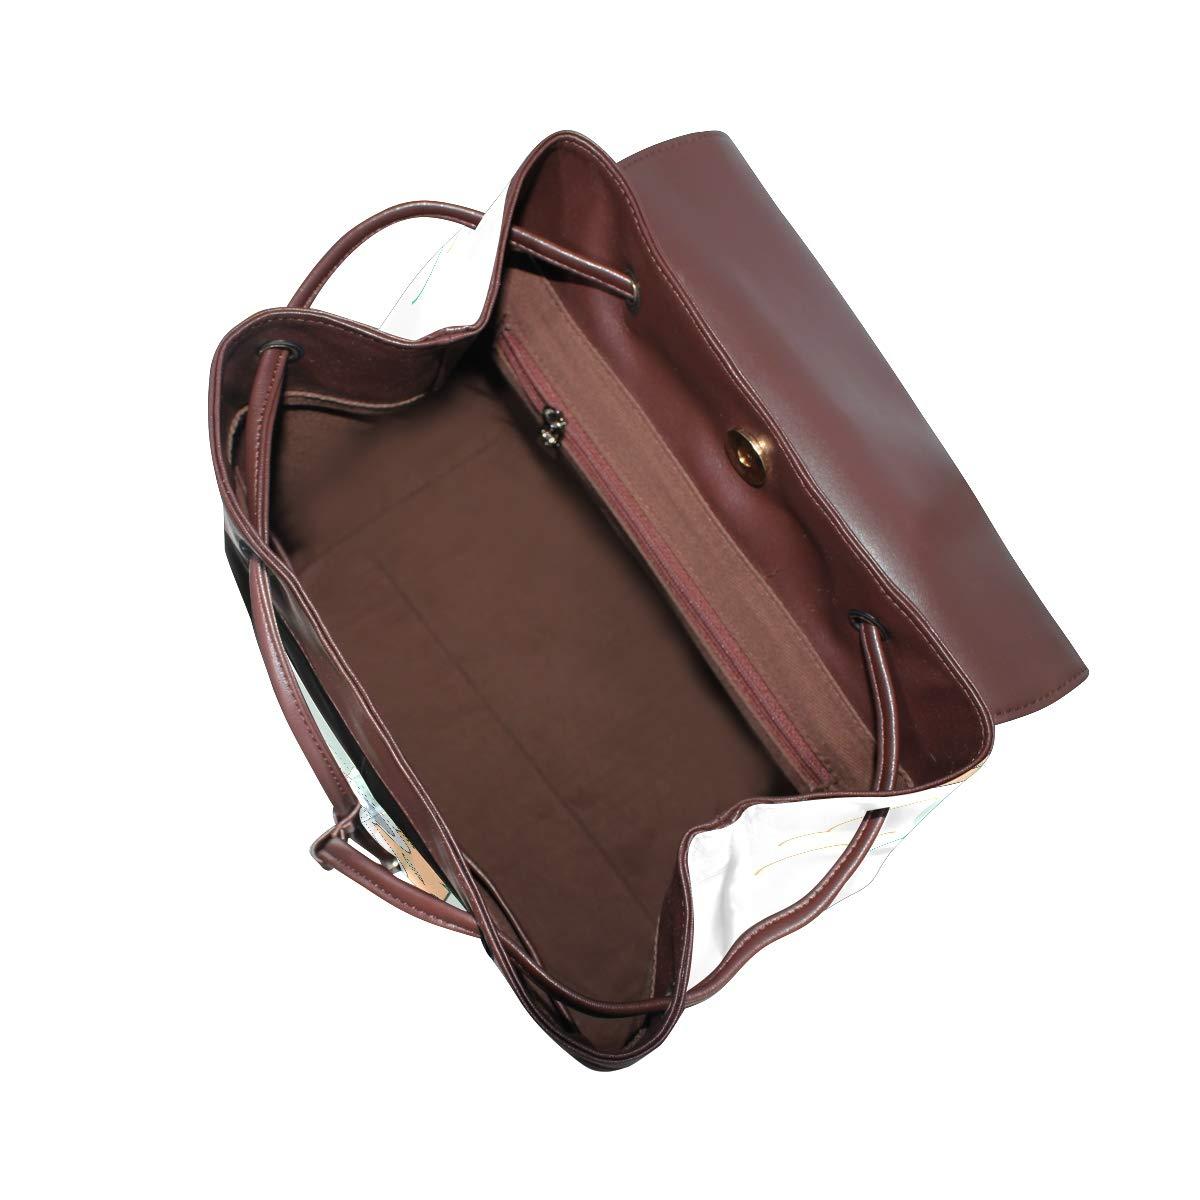 PU Leather Shoulder Bag,Koala Backpack,Portable Travel School Rucksack,Satchel with Top Handle